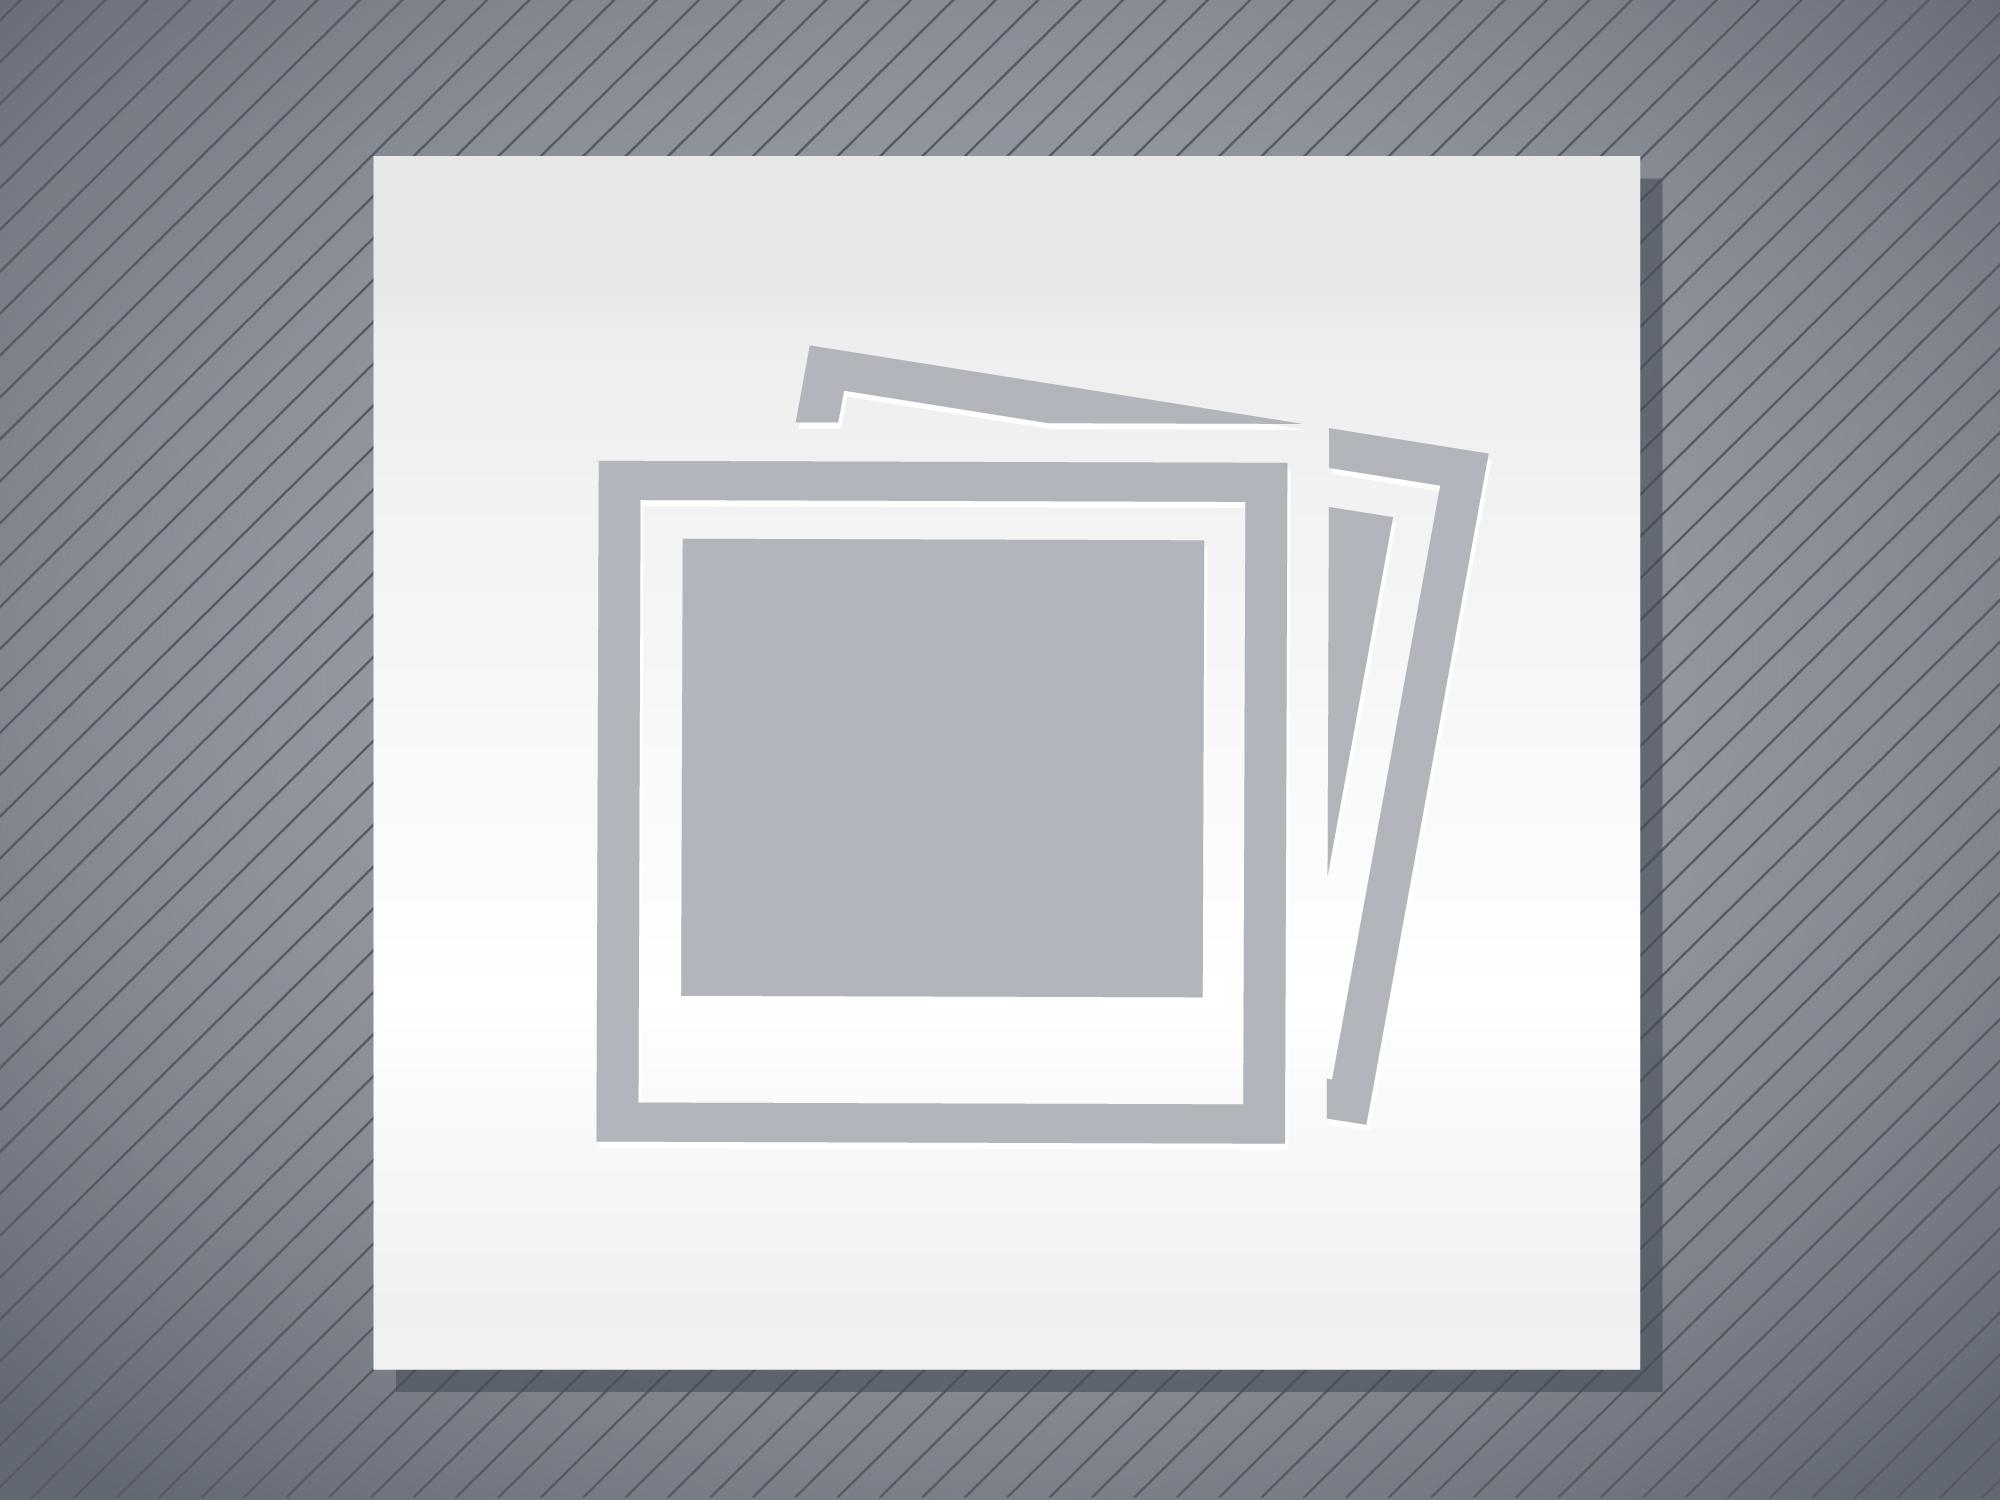 best writing app for ipad